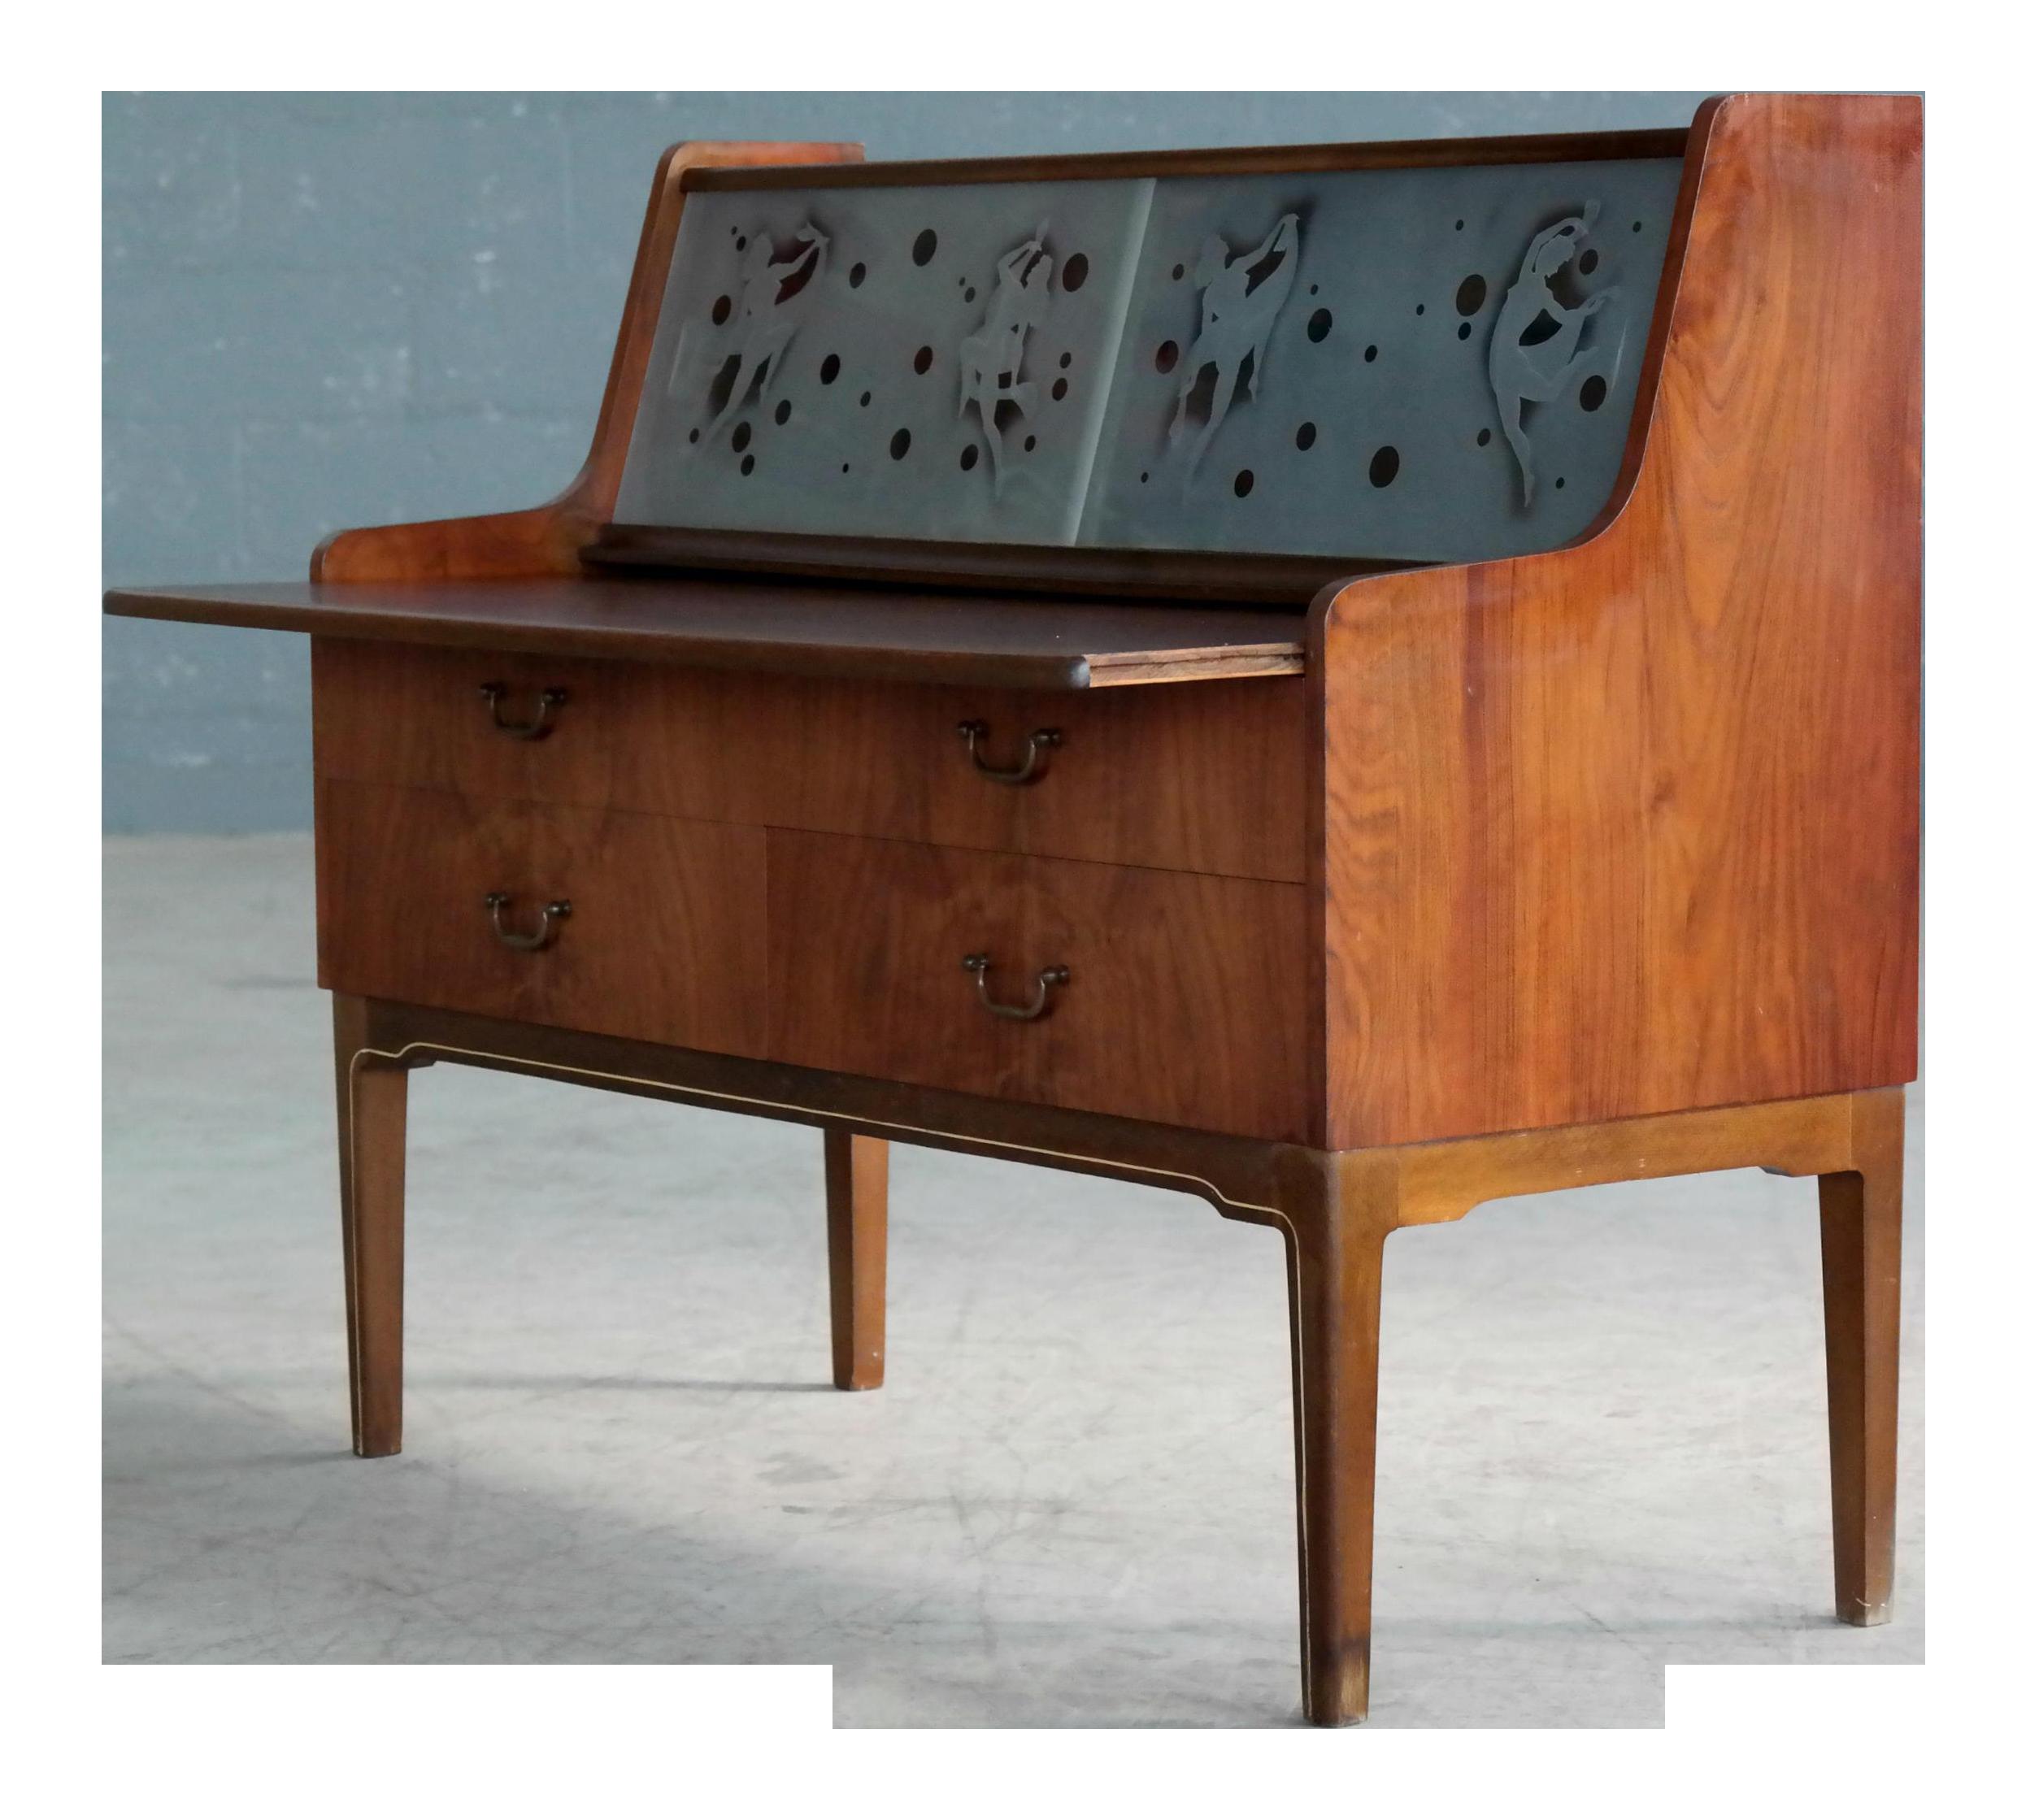 custom standing desk kidney shaped mid. Wonderful Shaped Danish Mid Century Modern Petite Vanity Desk With Glass Etchings To Custom Standing Kidney Shaped